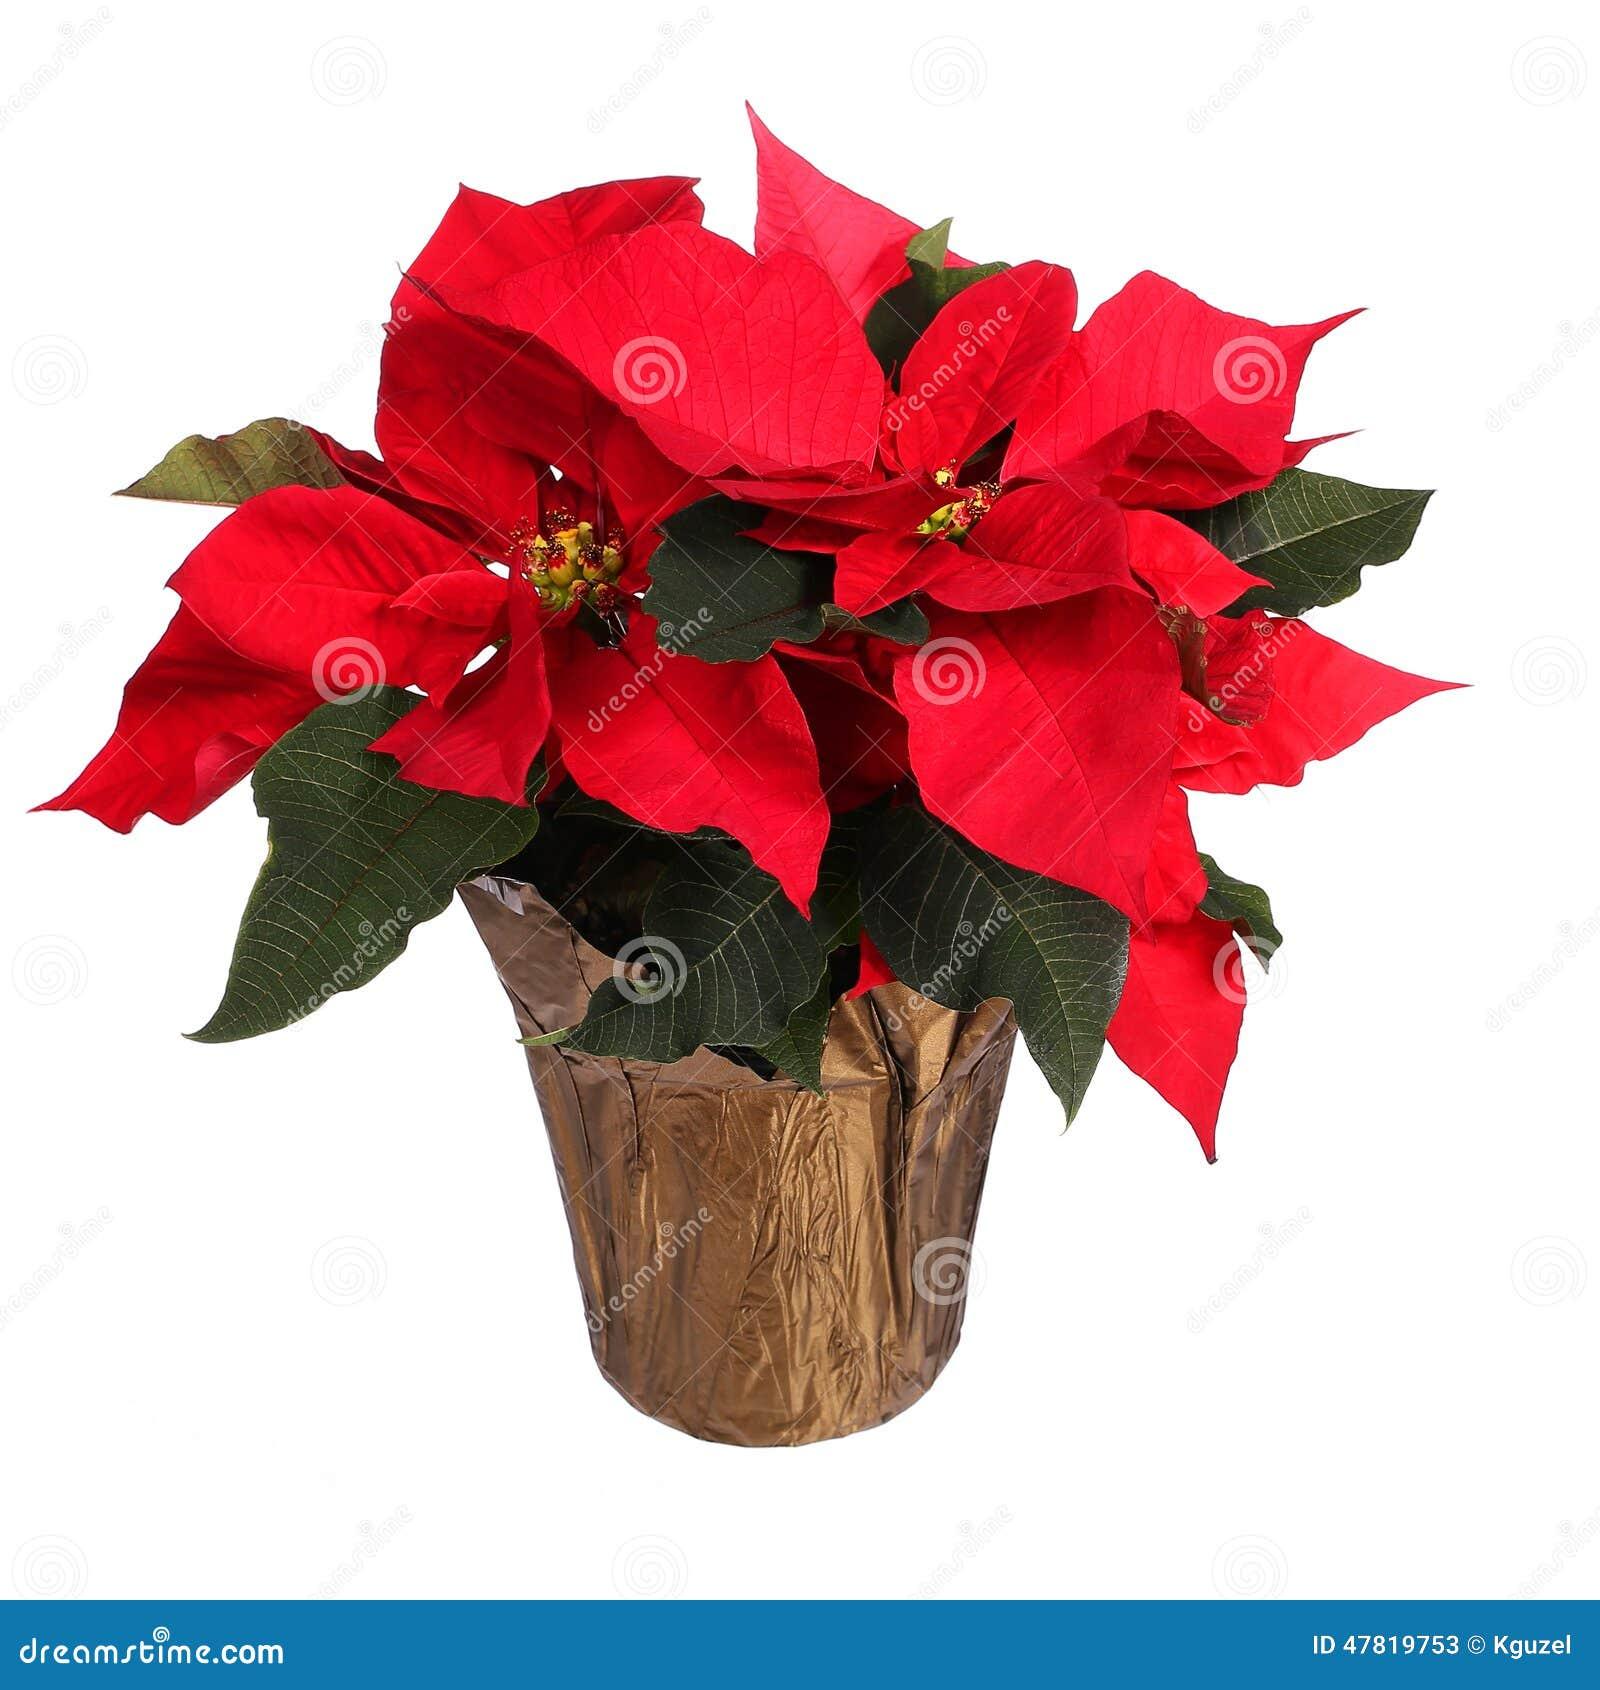 BON MARDI  B_1_q_0_p_0.jpg?u=https%3A%2F%2Fthumbs.dreamstime.com%2Fz%2Fred-poinsettia-flower-isolated-christmas-flowers-white-47819753